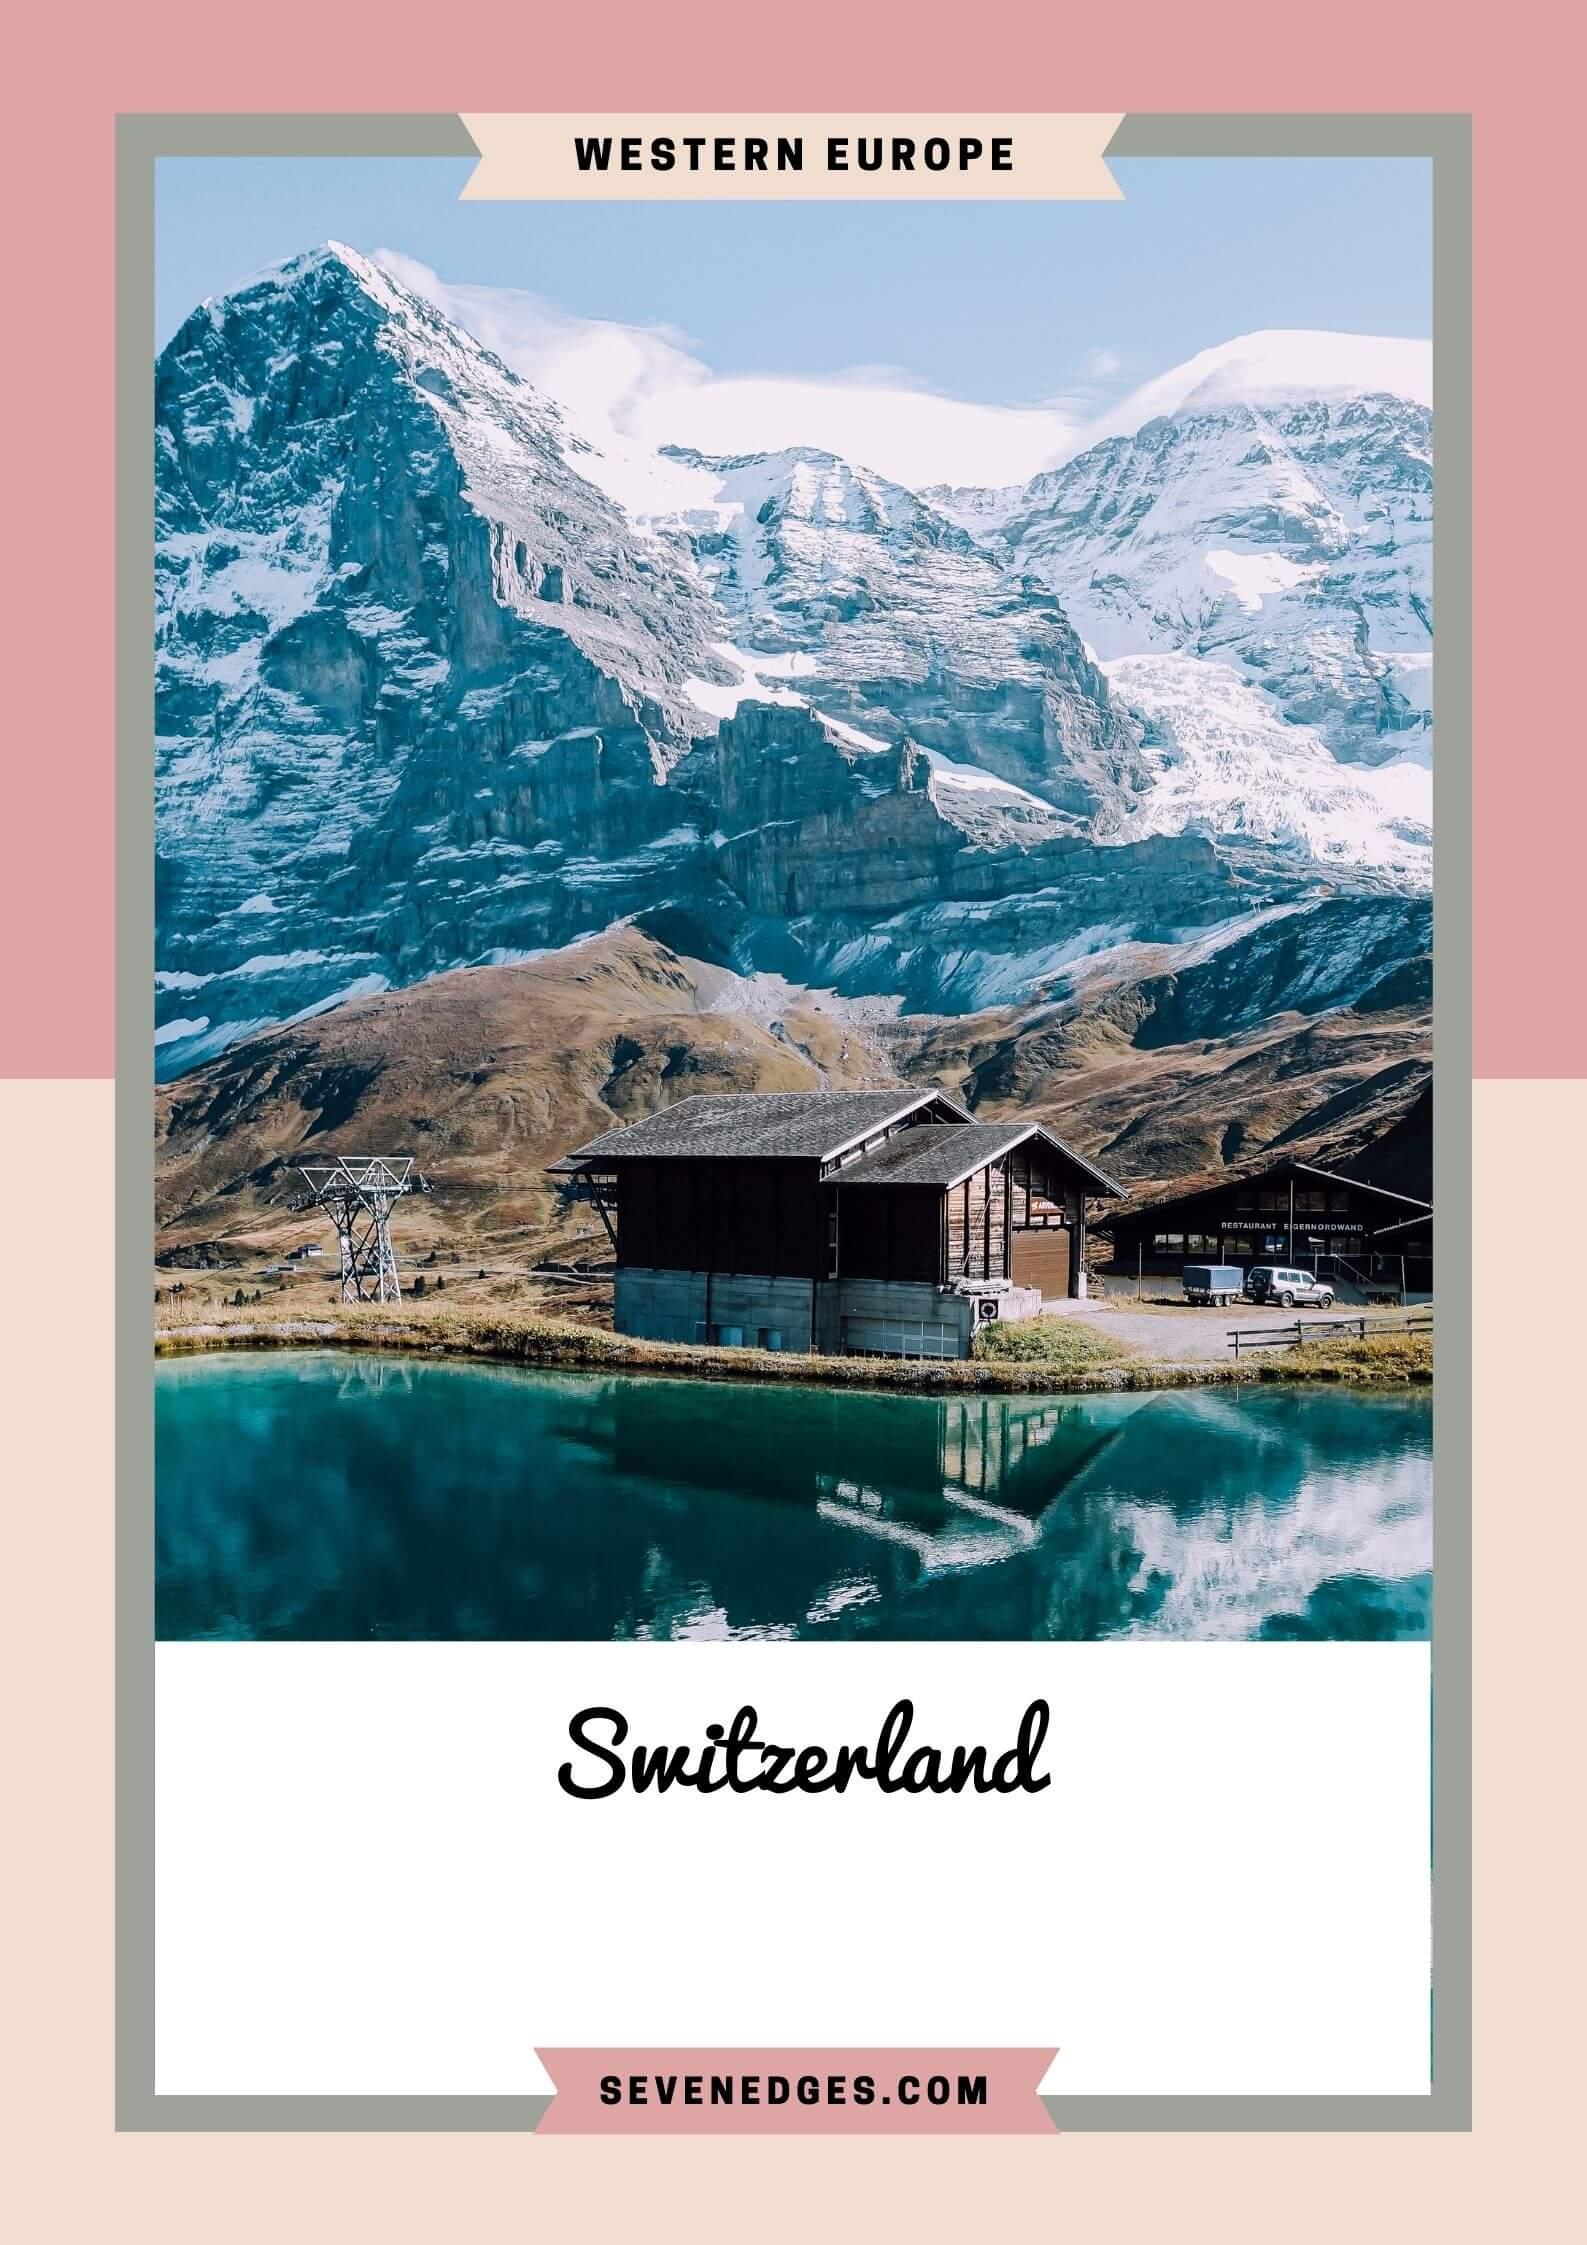 Switerland